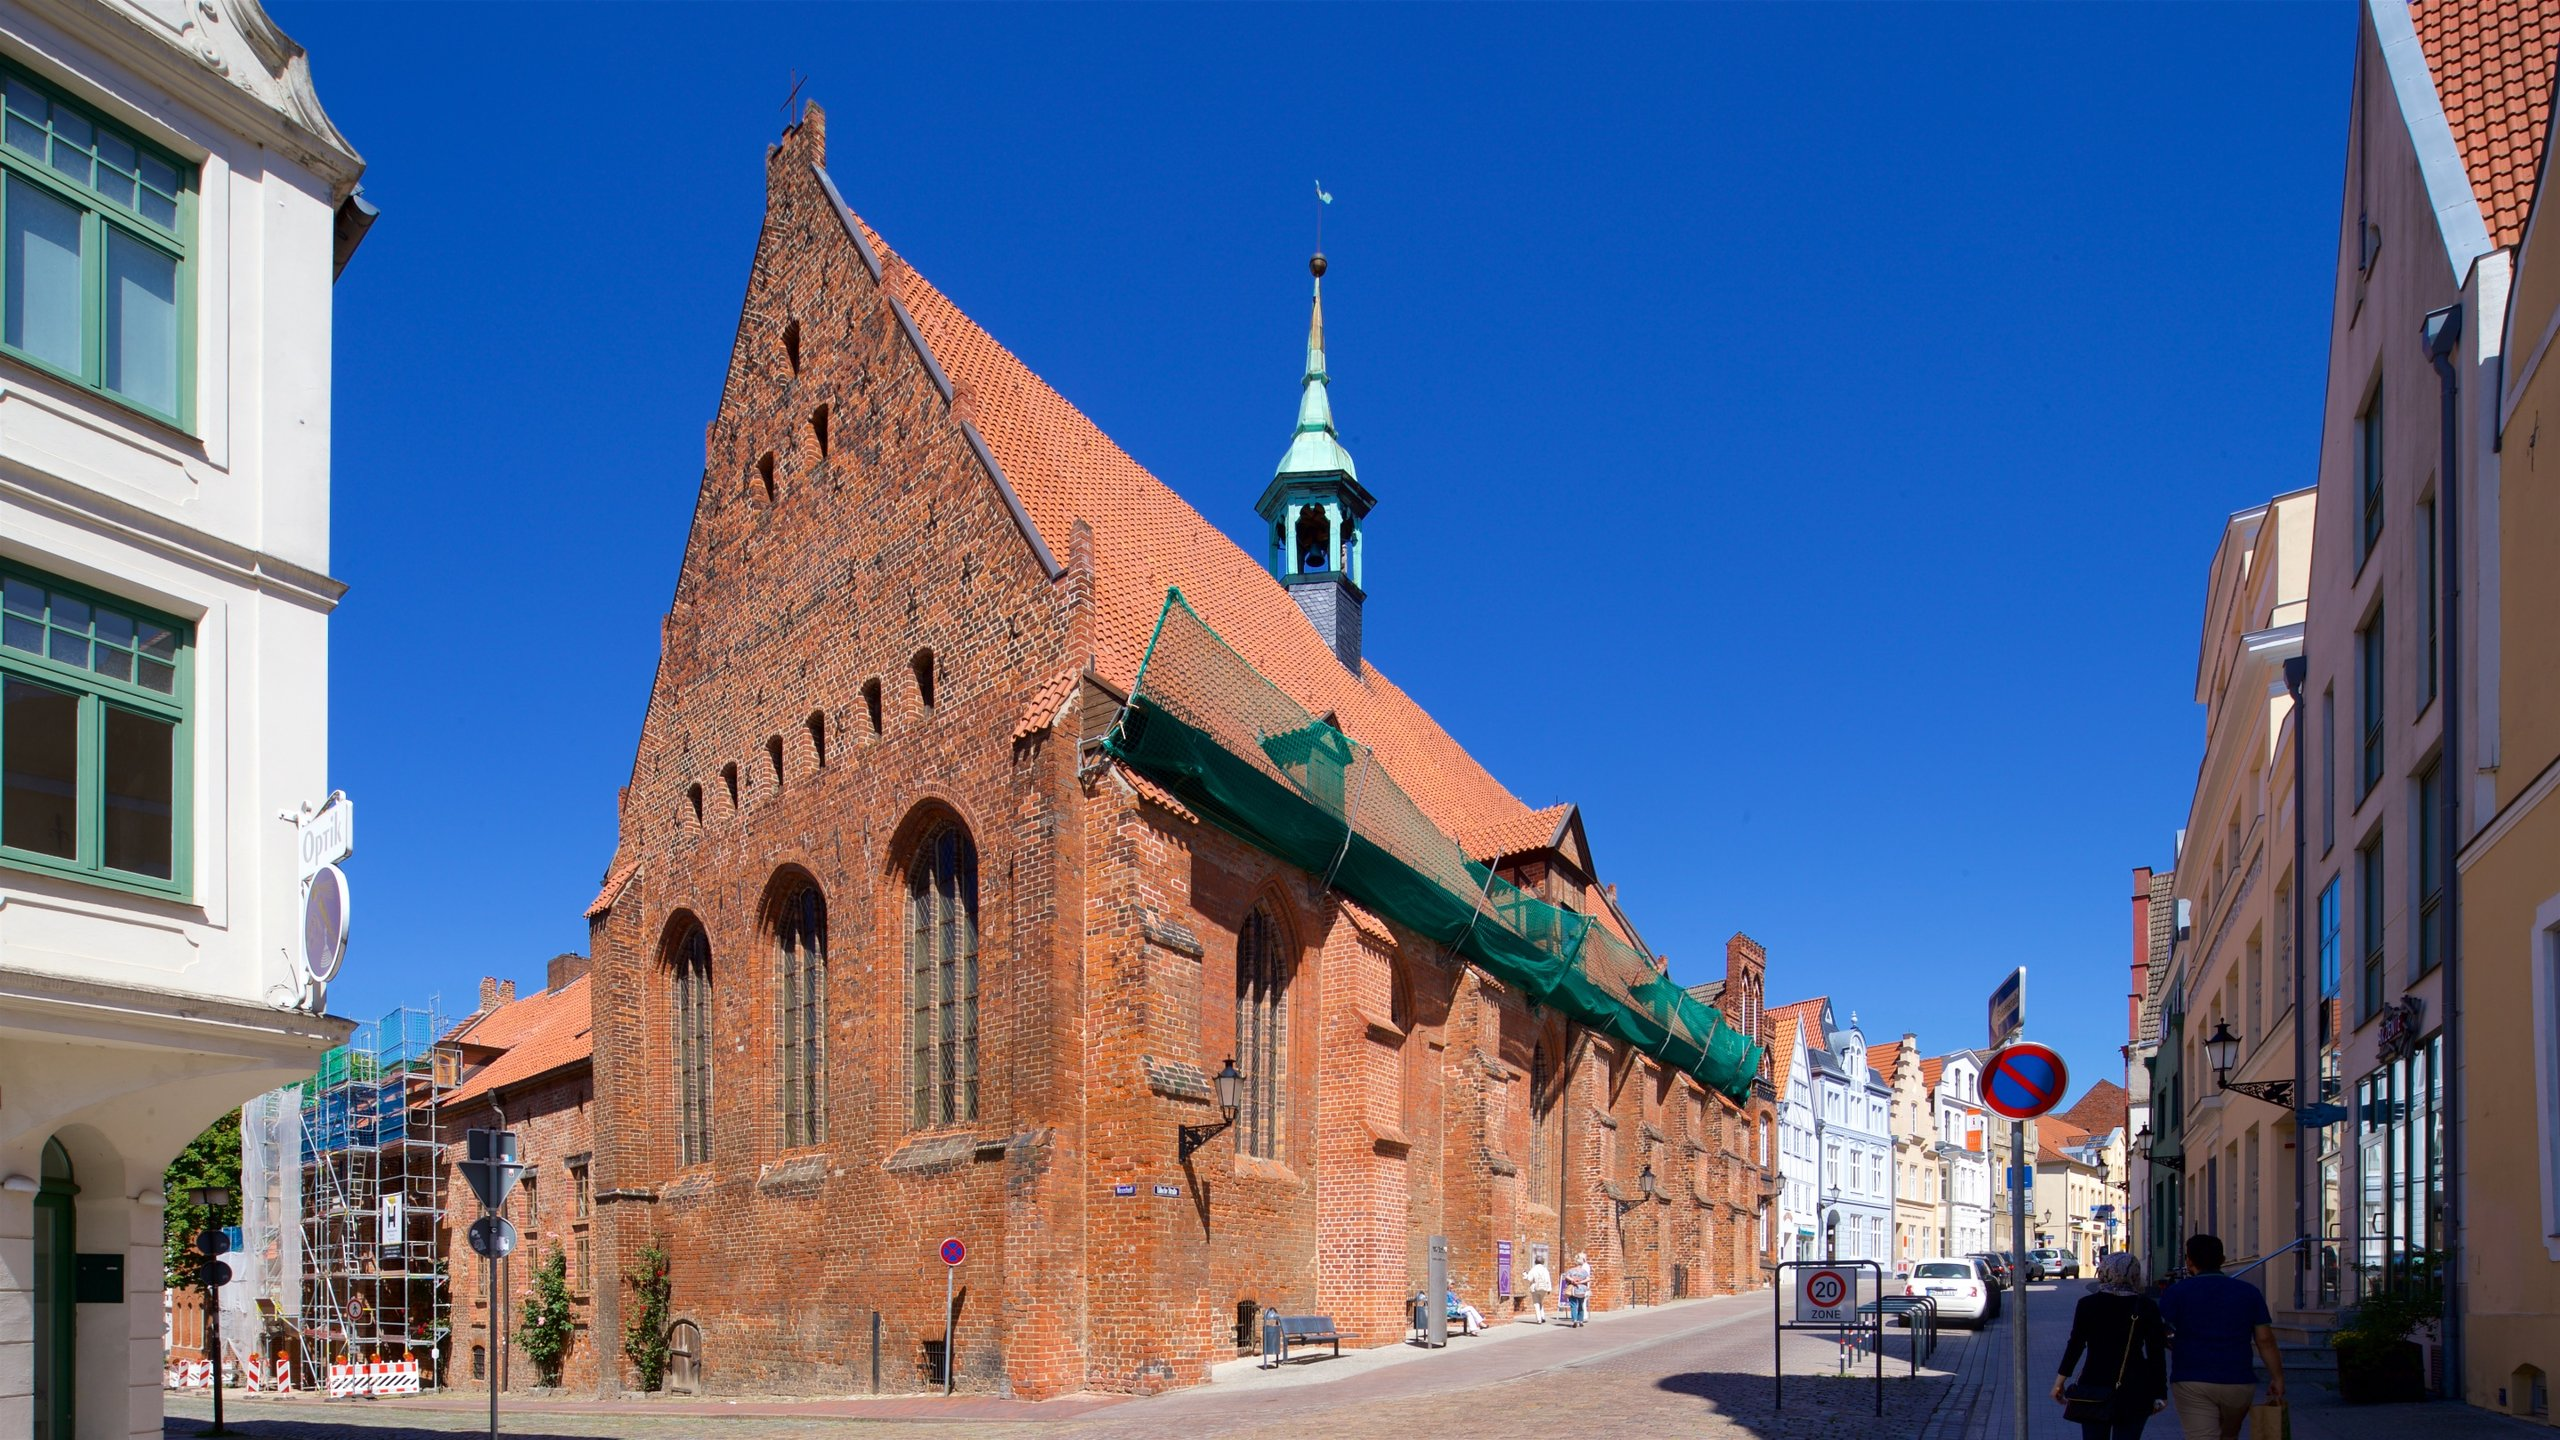 Holy Spirit Church, Wismar, Mecklenburg-West Pomerania, Germany